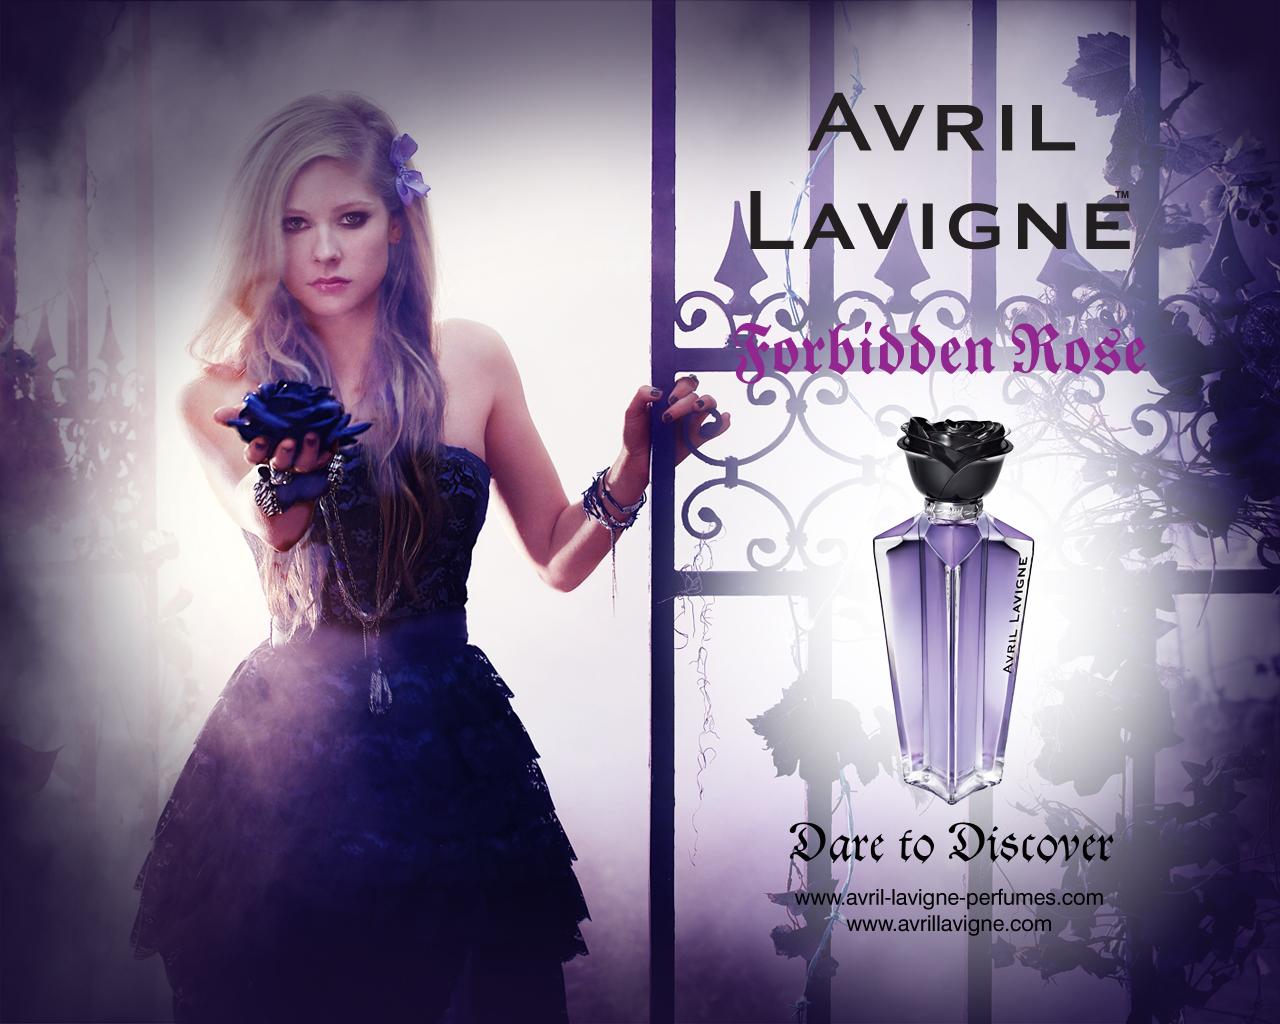 Avril Lavigne Perfume